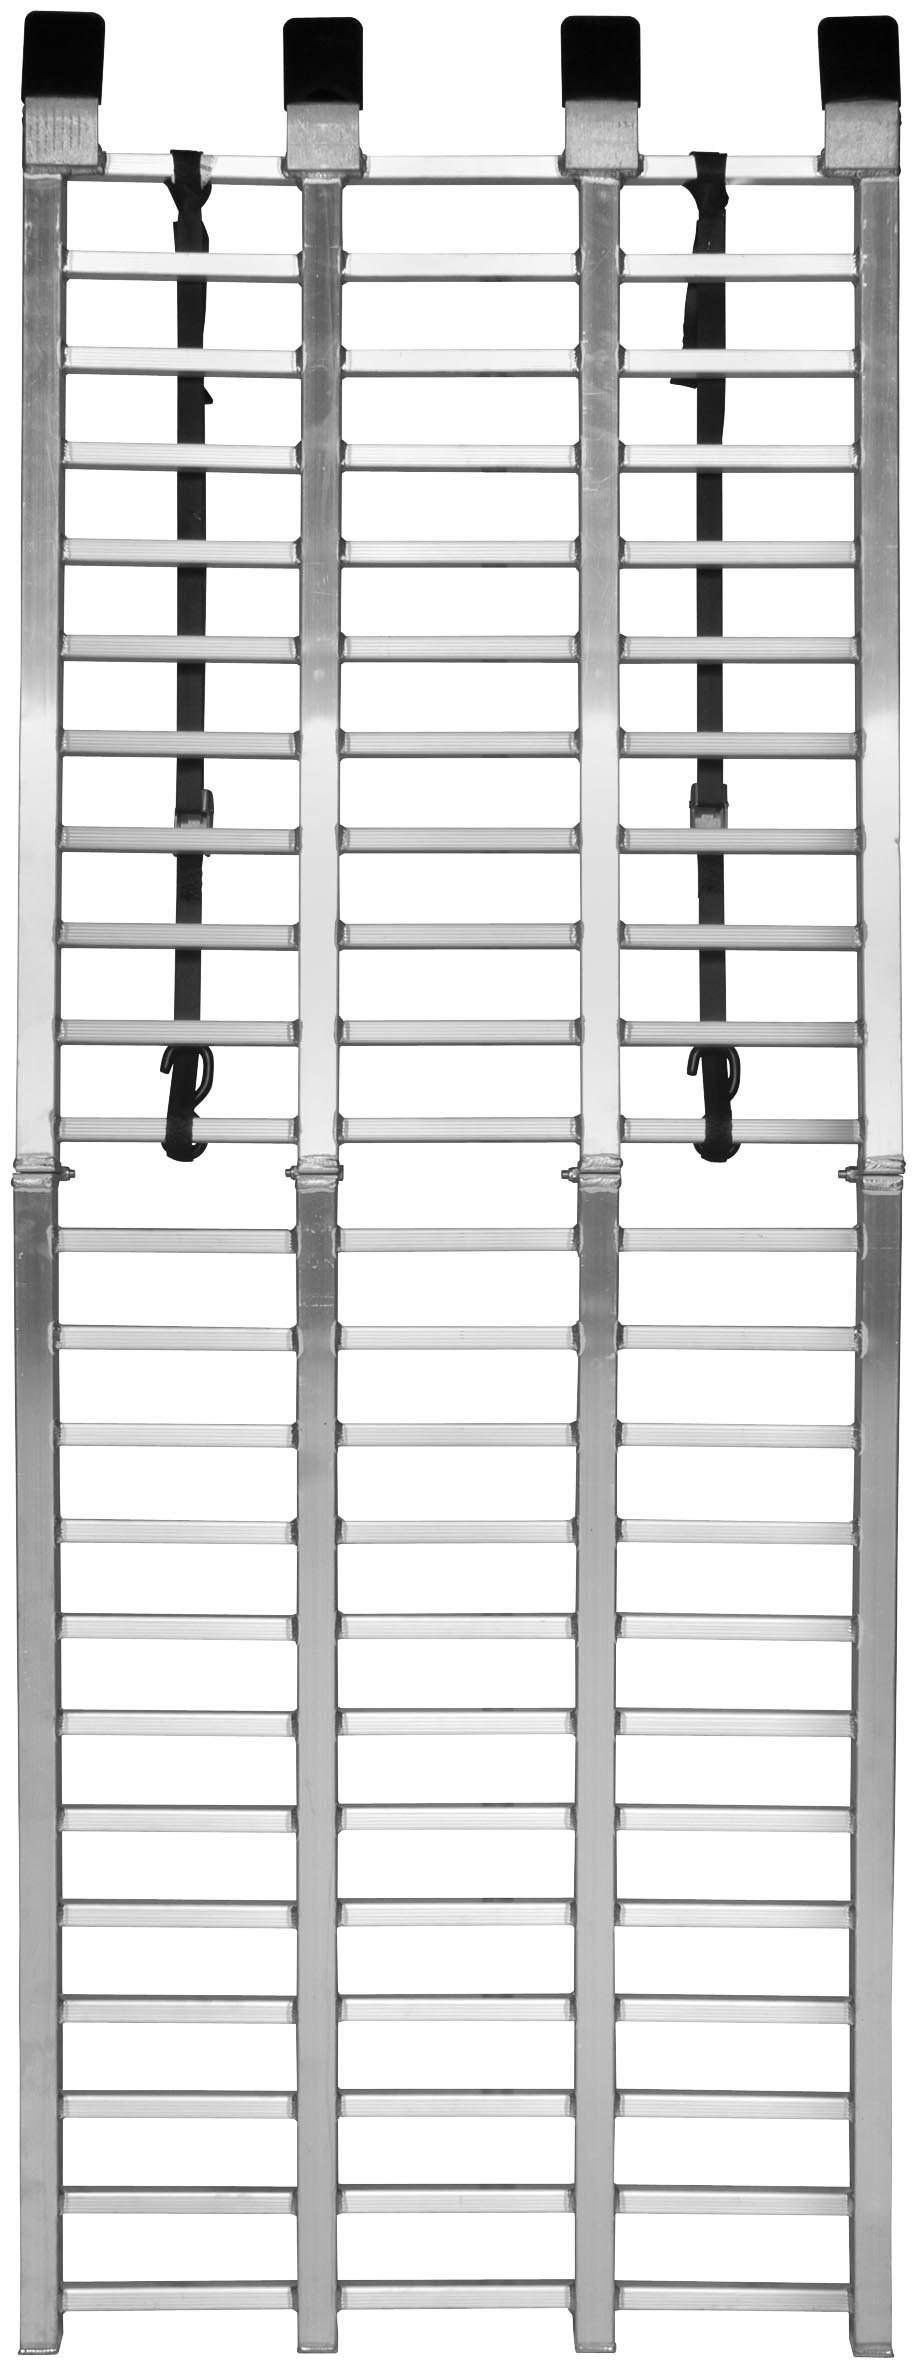 QuadBoss Aluminum Arched Ramp - Folding Wide Boy - 33in. W x 88in. L 3792